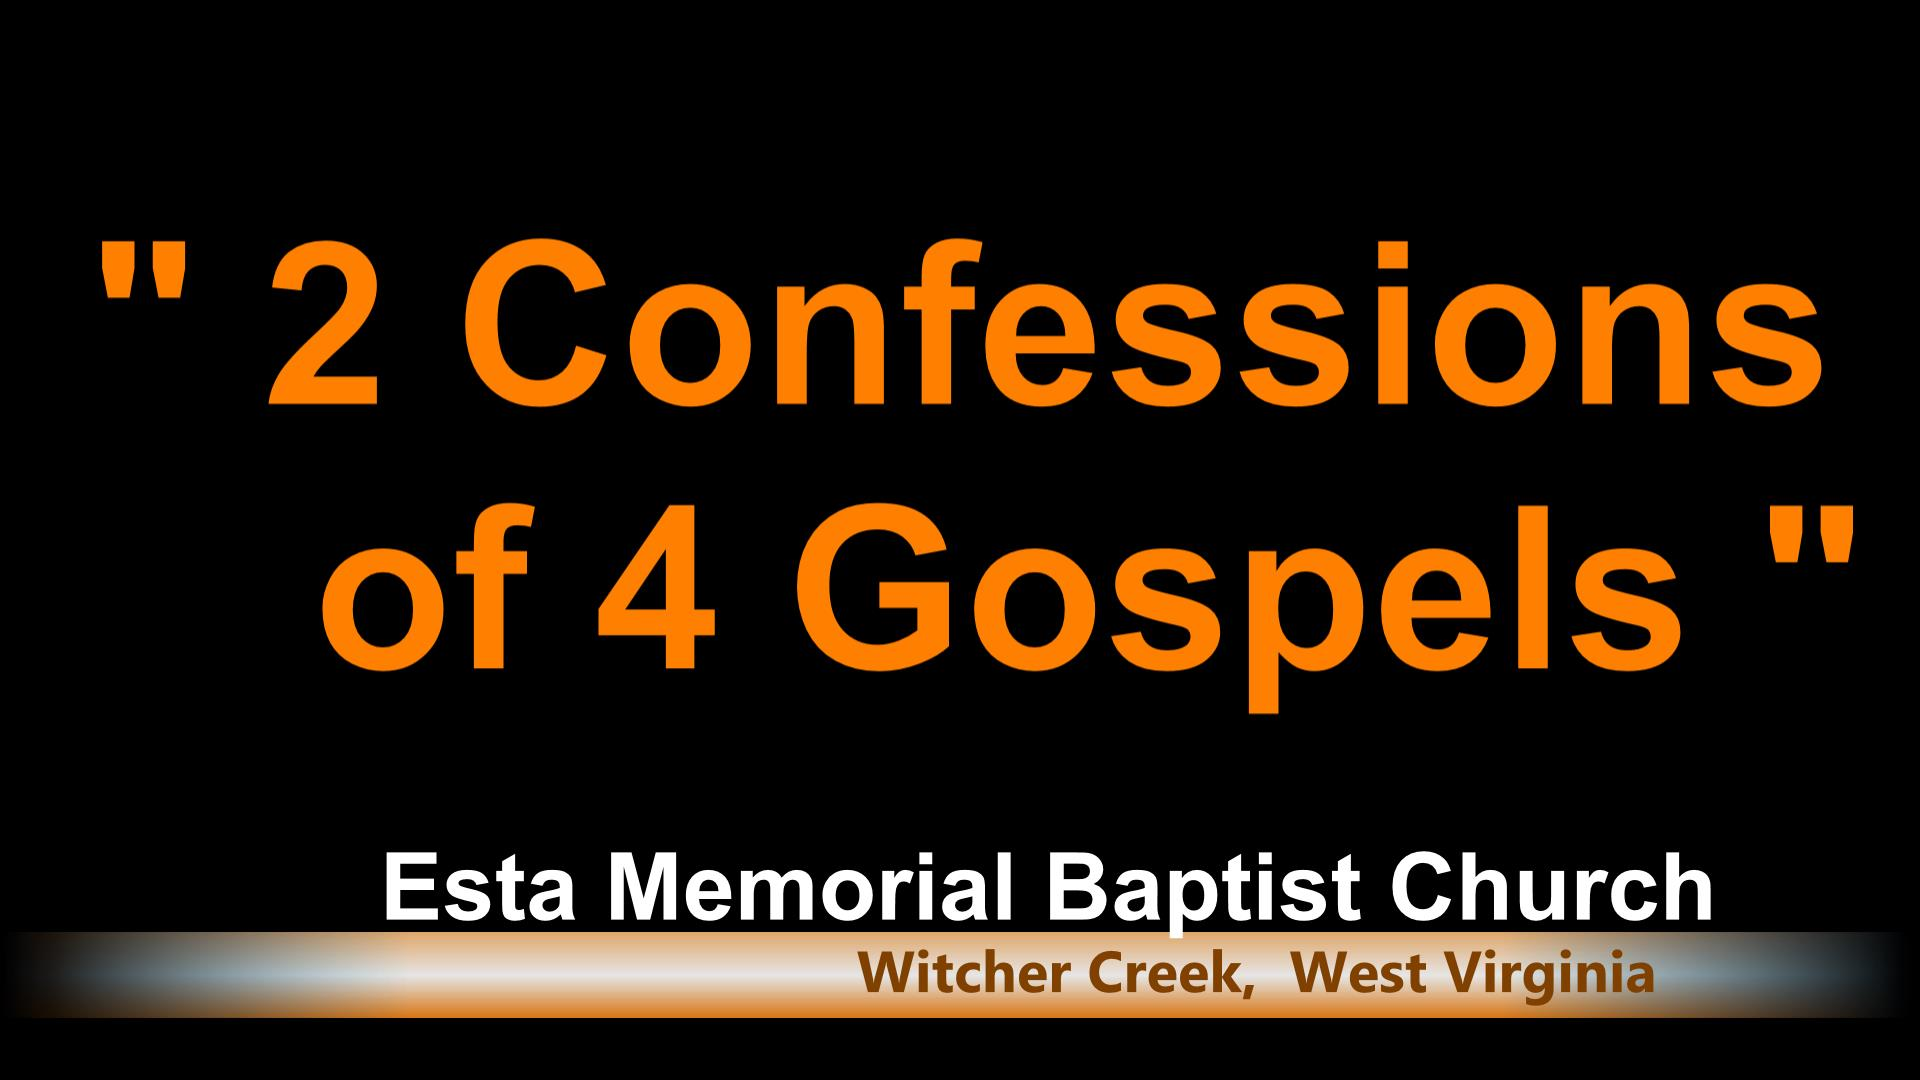 2 Confessions of 4 Gospels